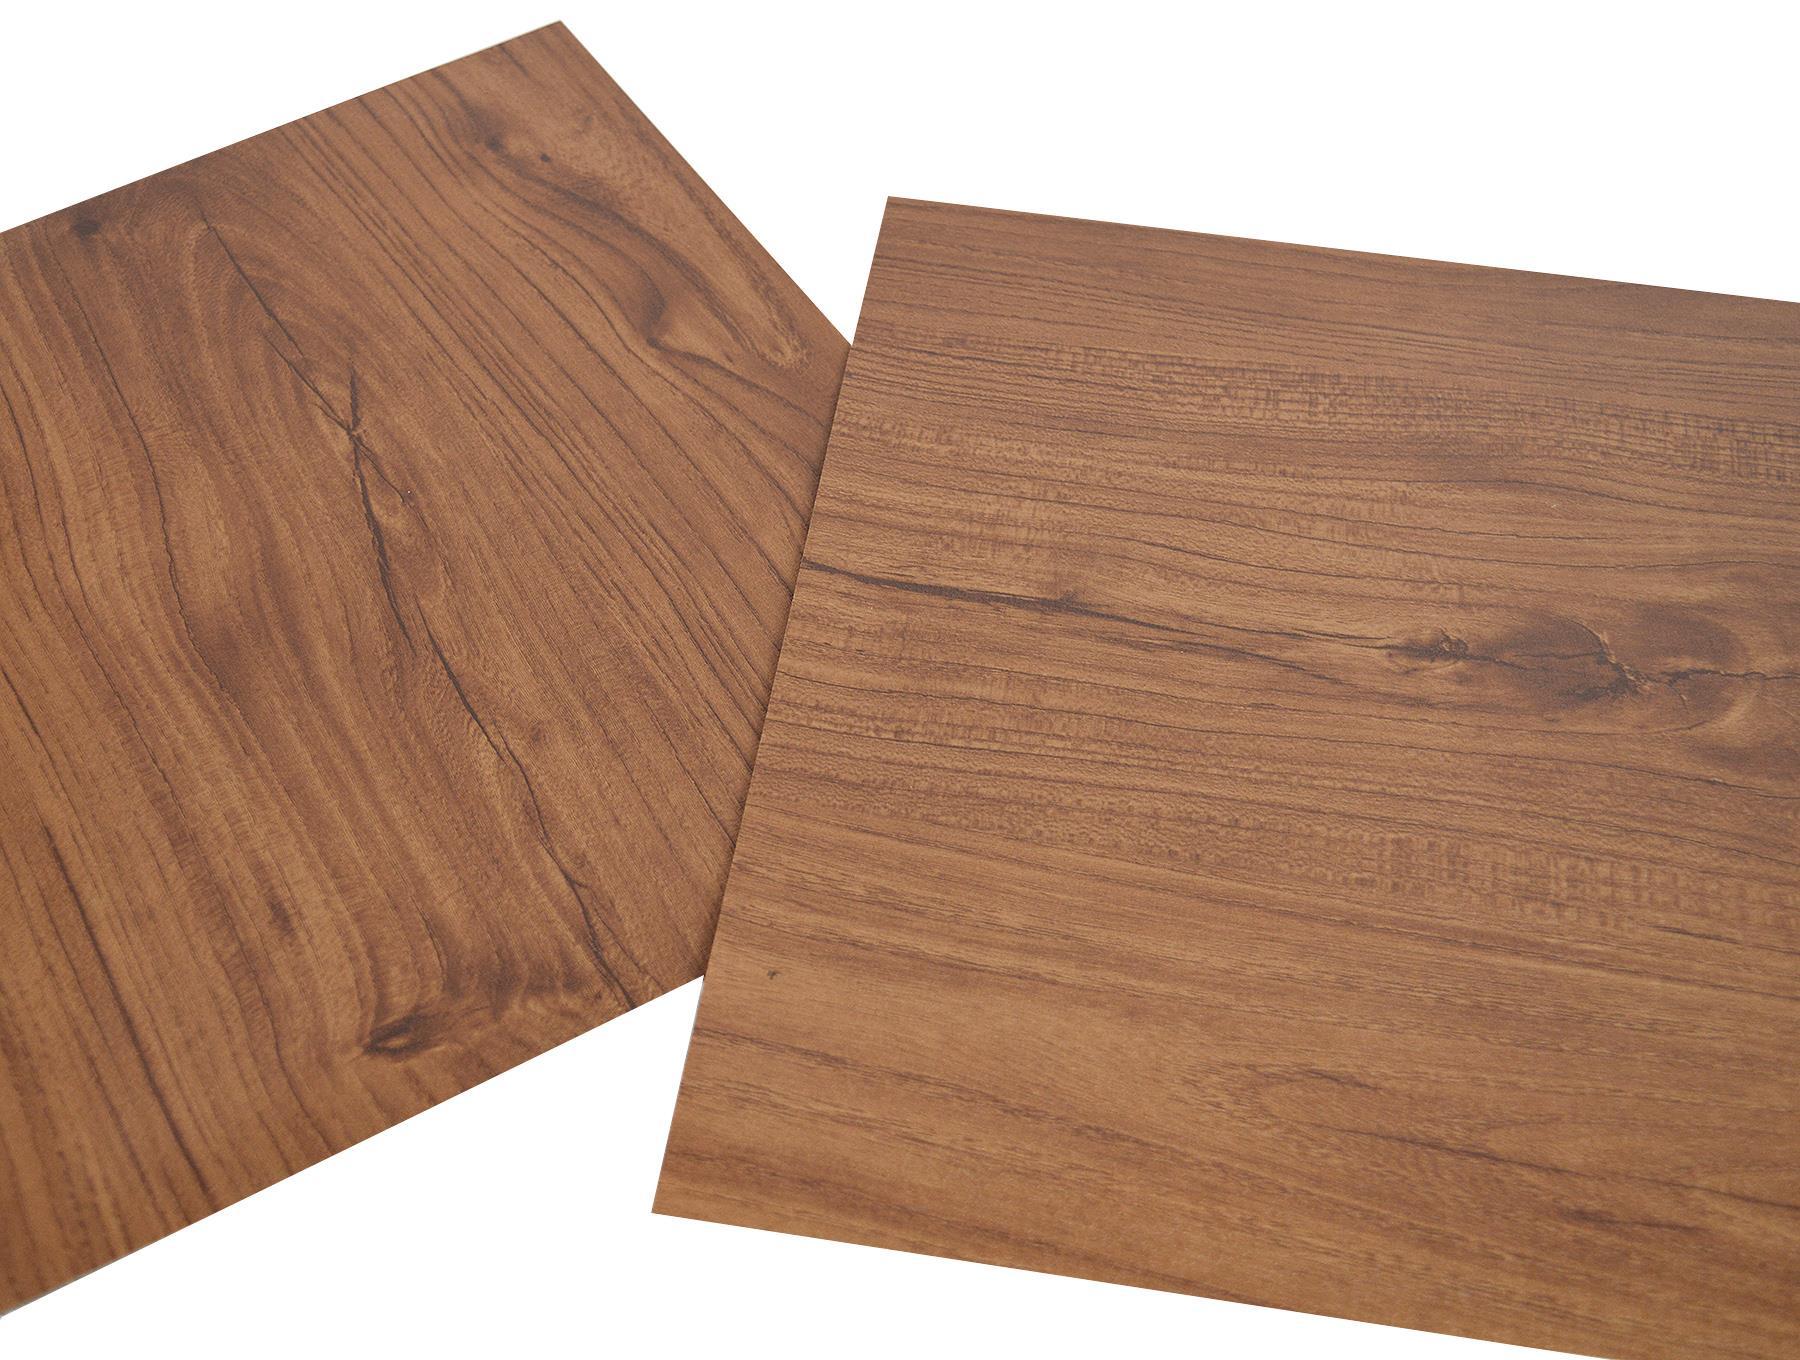 Floor-Tiles-Self-Adhesive-Vinyl-Flooring-Kitchen-Bathroom-Brown-Wood-Grain thumbnail 27